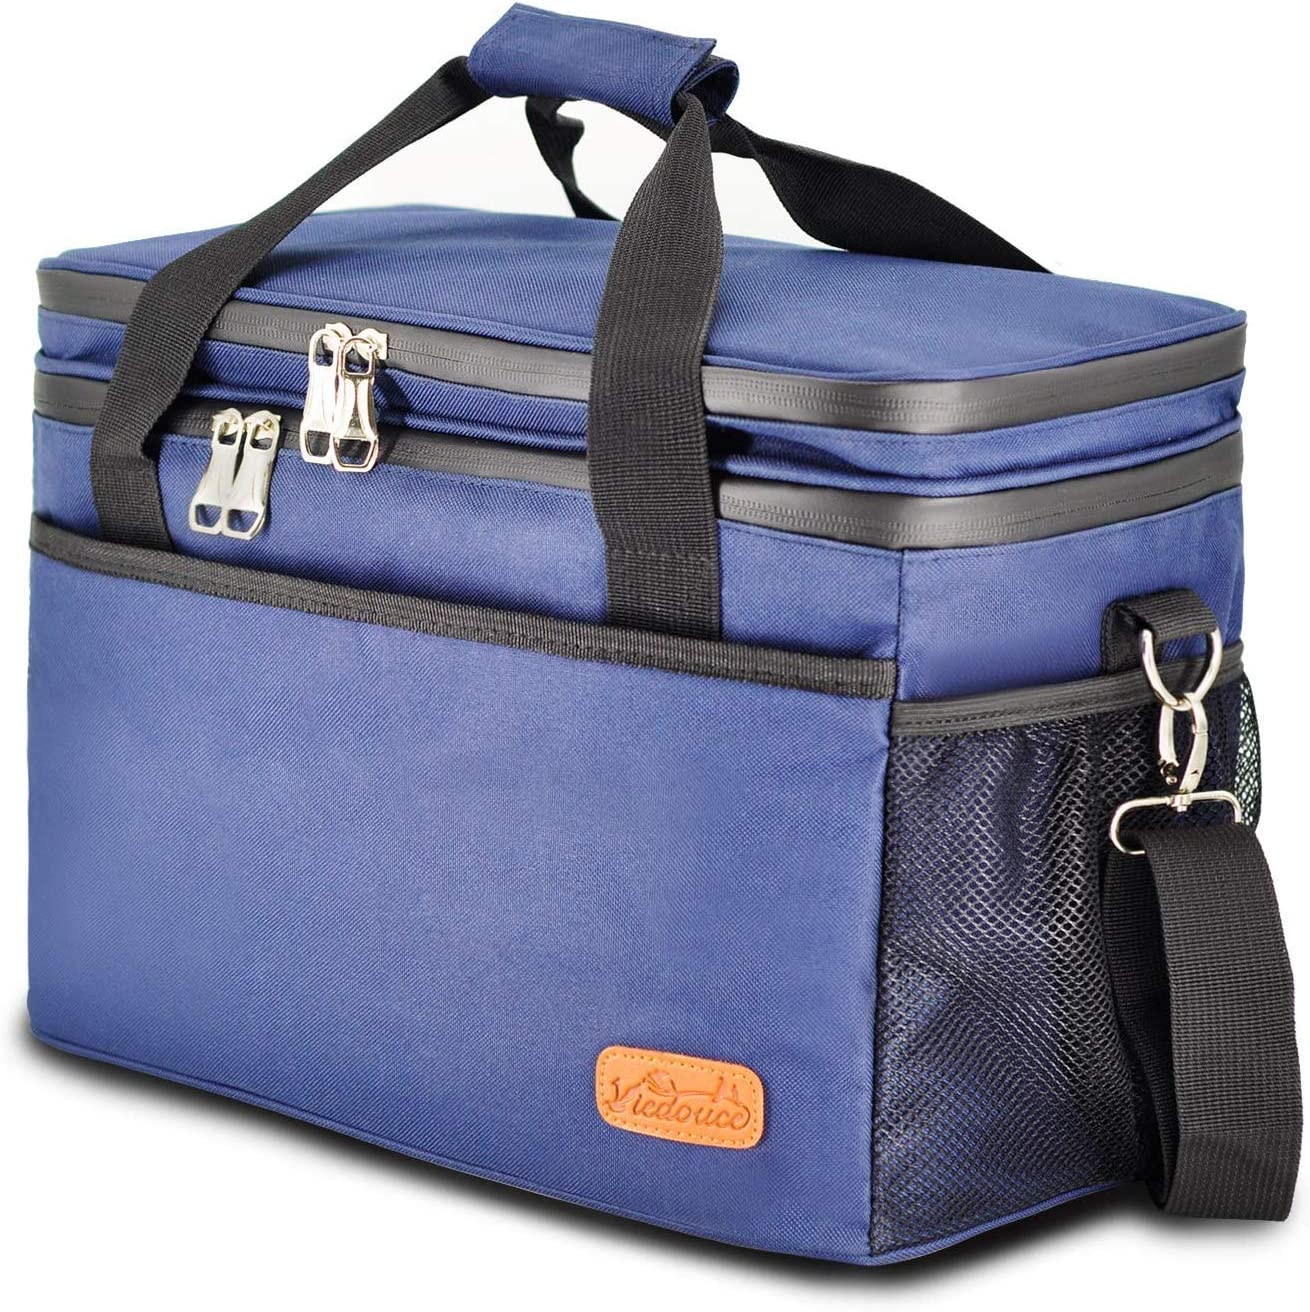 Viedouce Insulated Cooler Bag